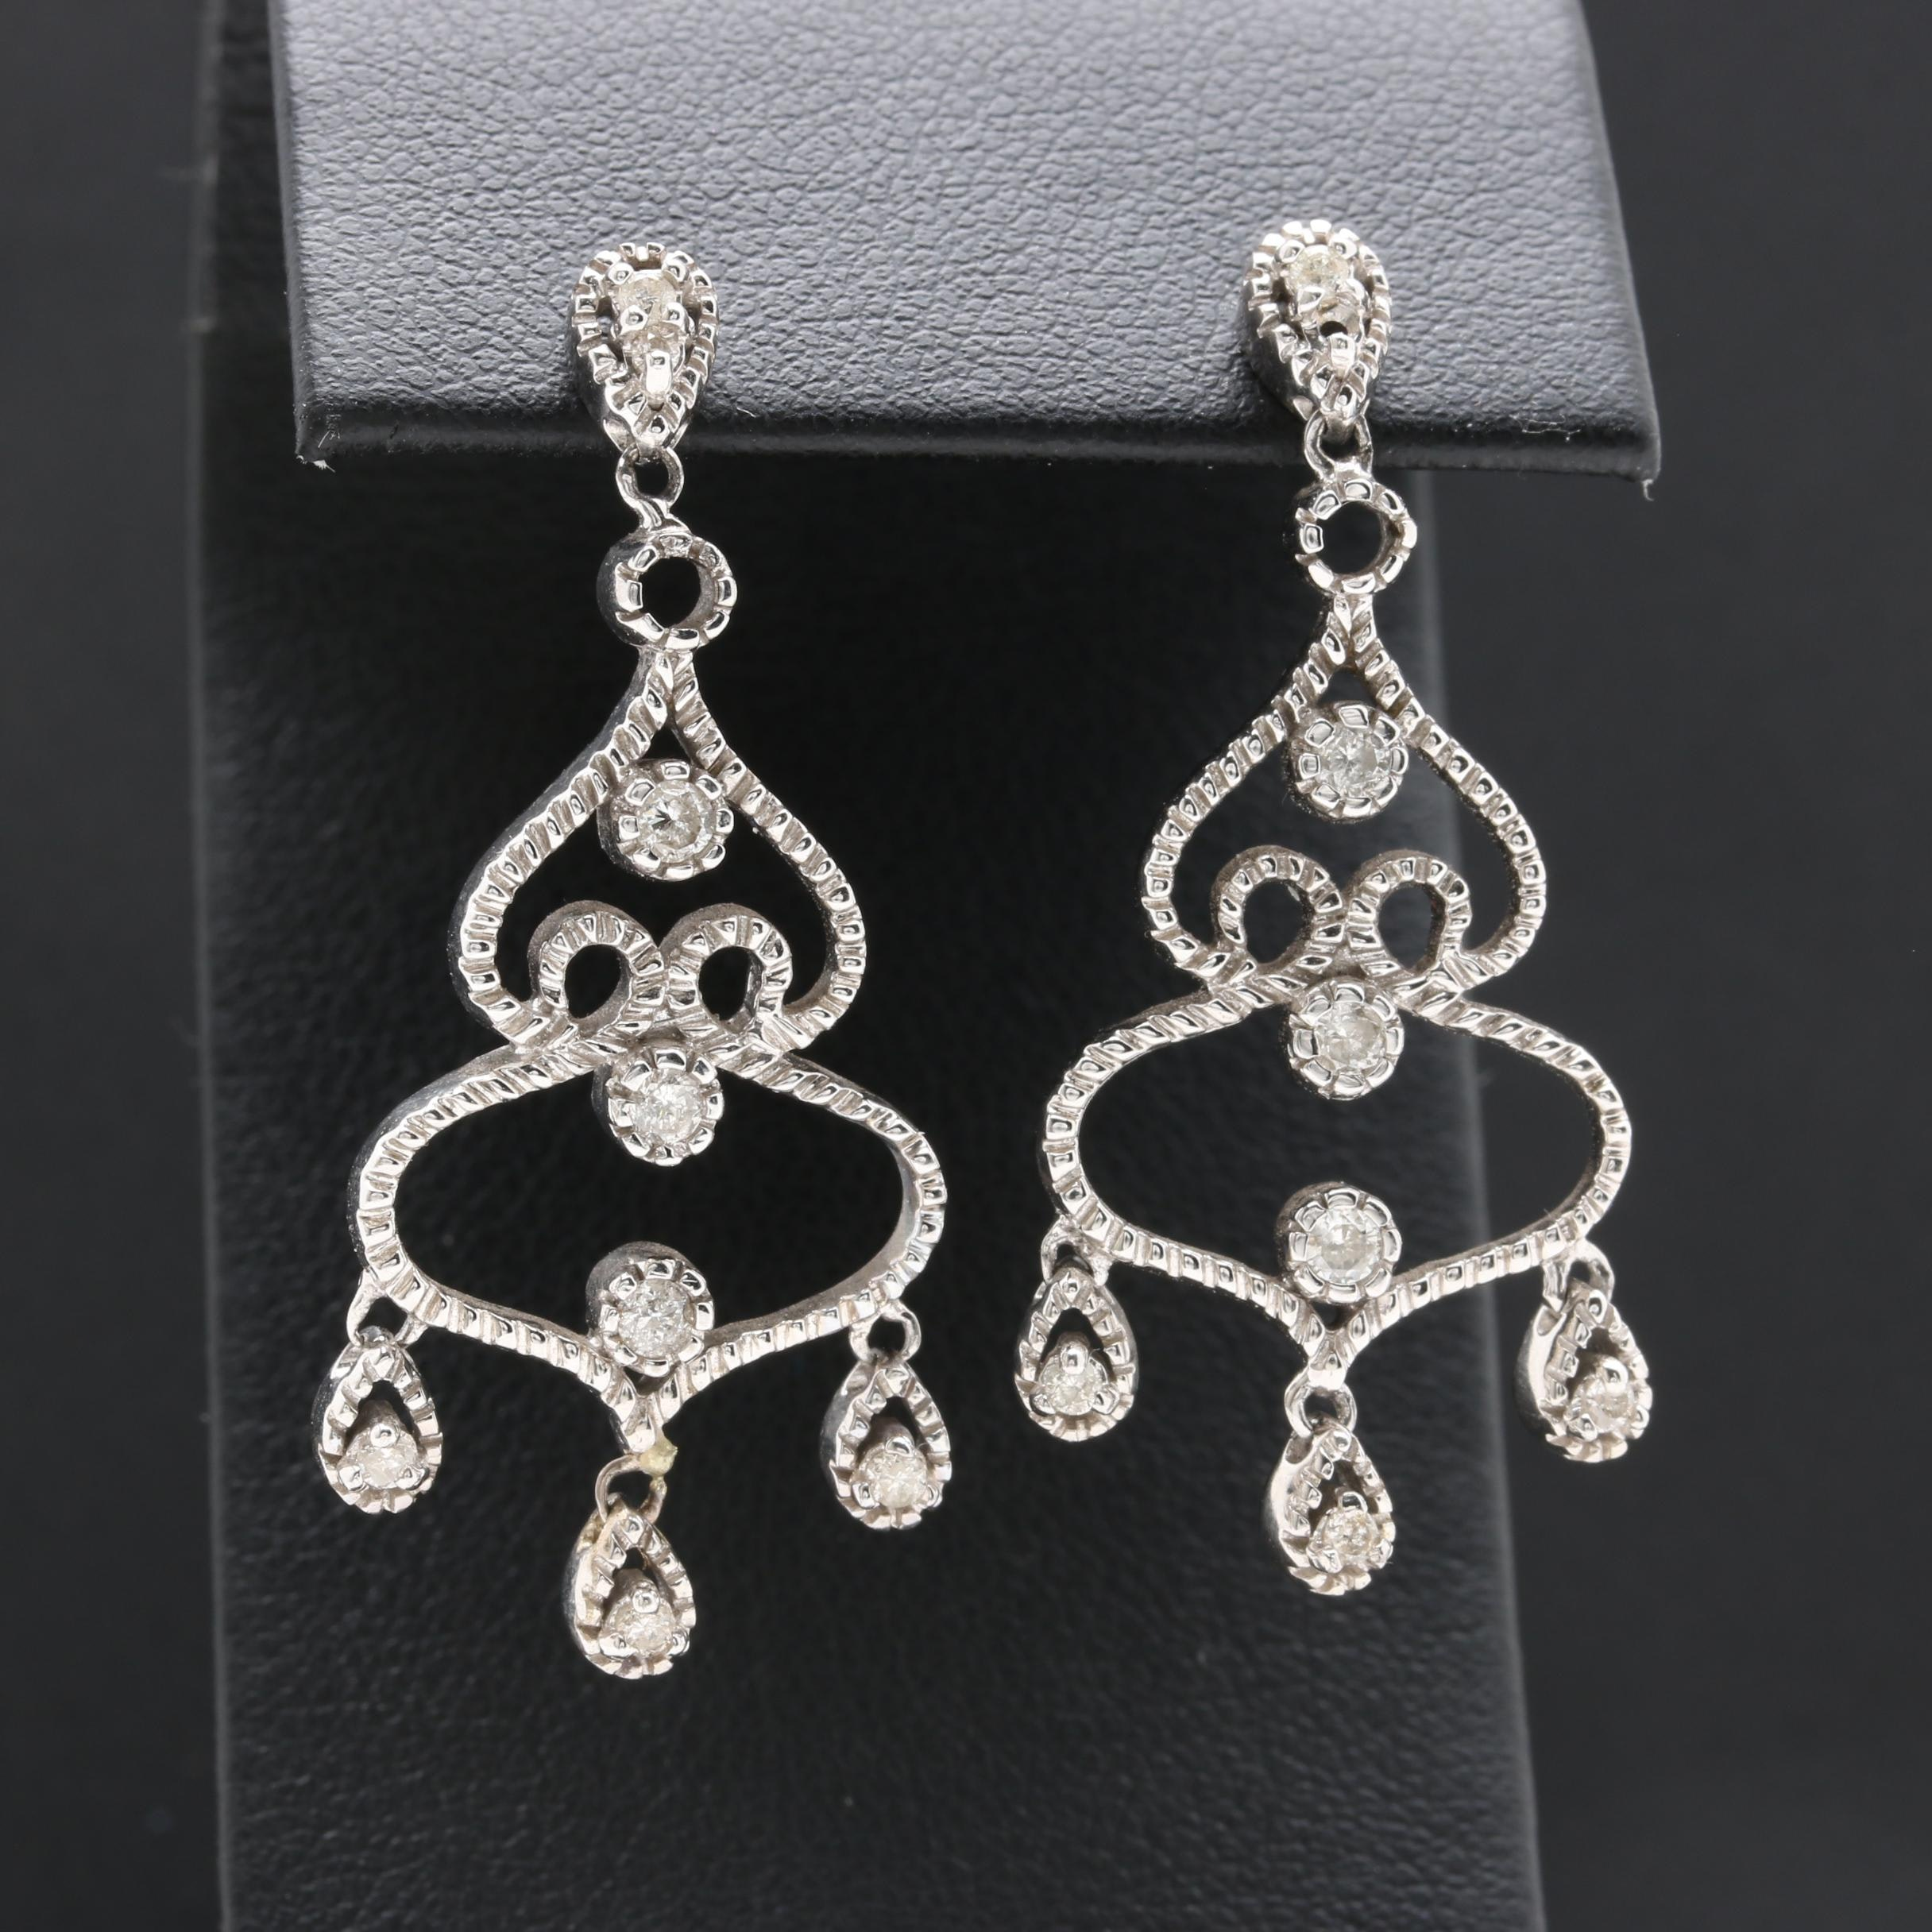 14K White Gold Diamond Chandelier Screw Back Earrings